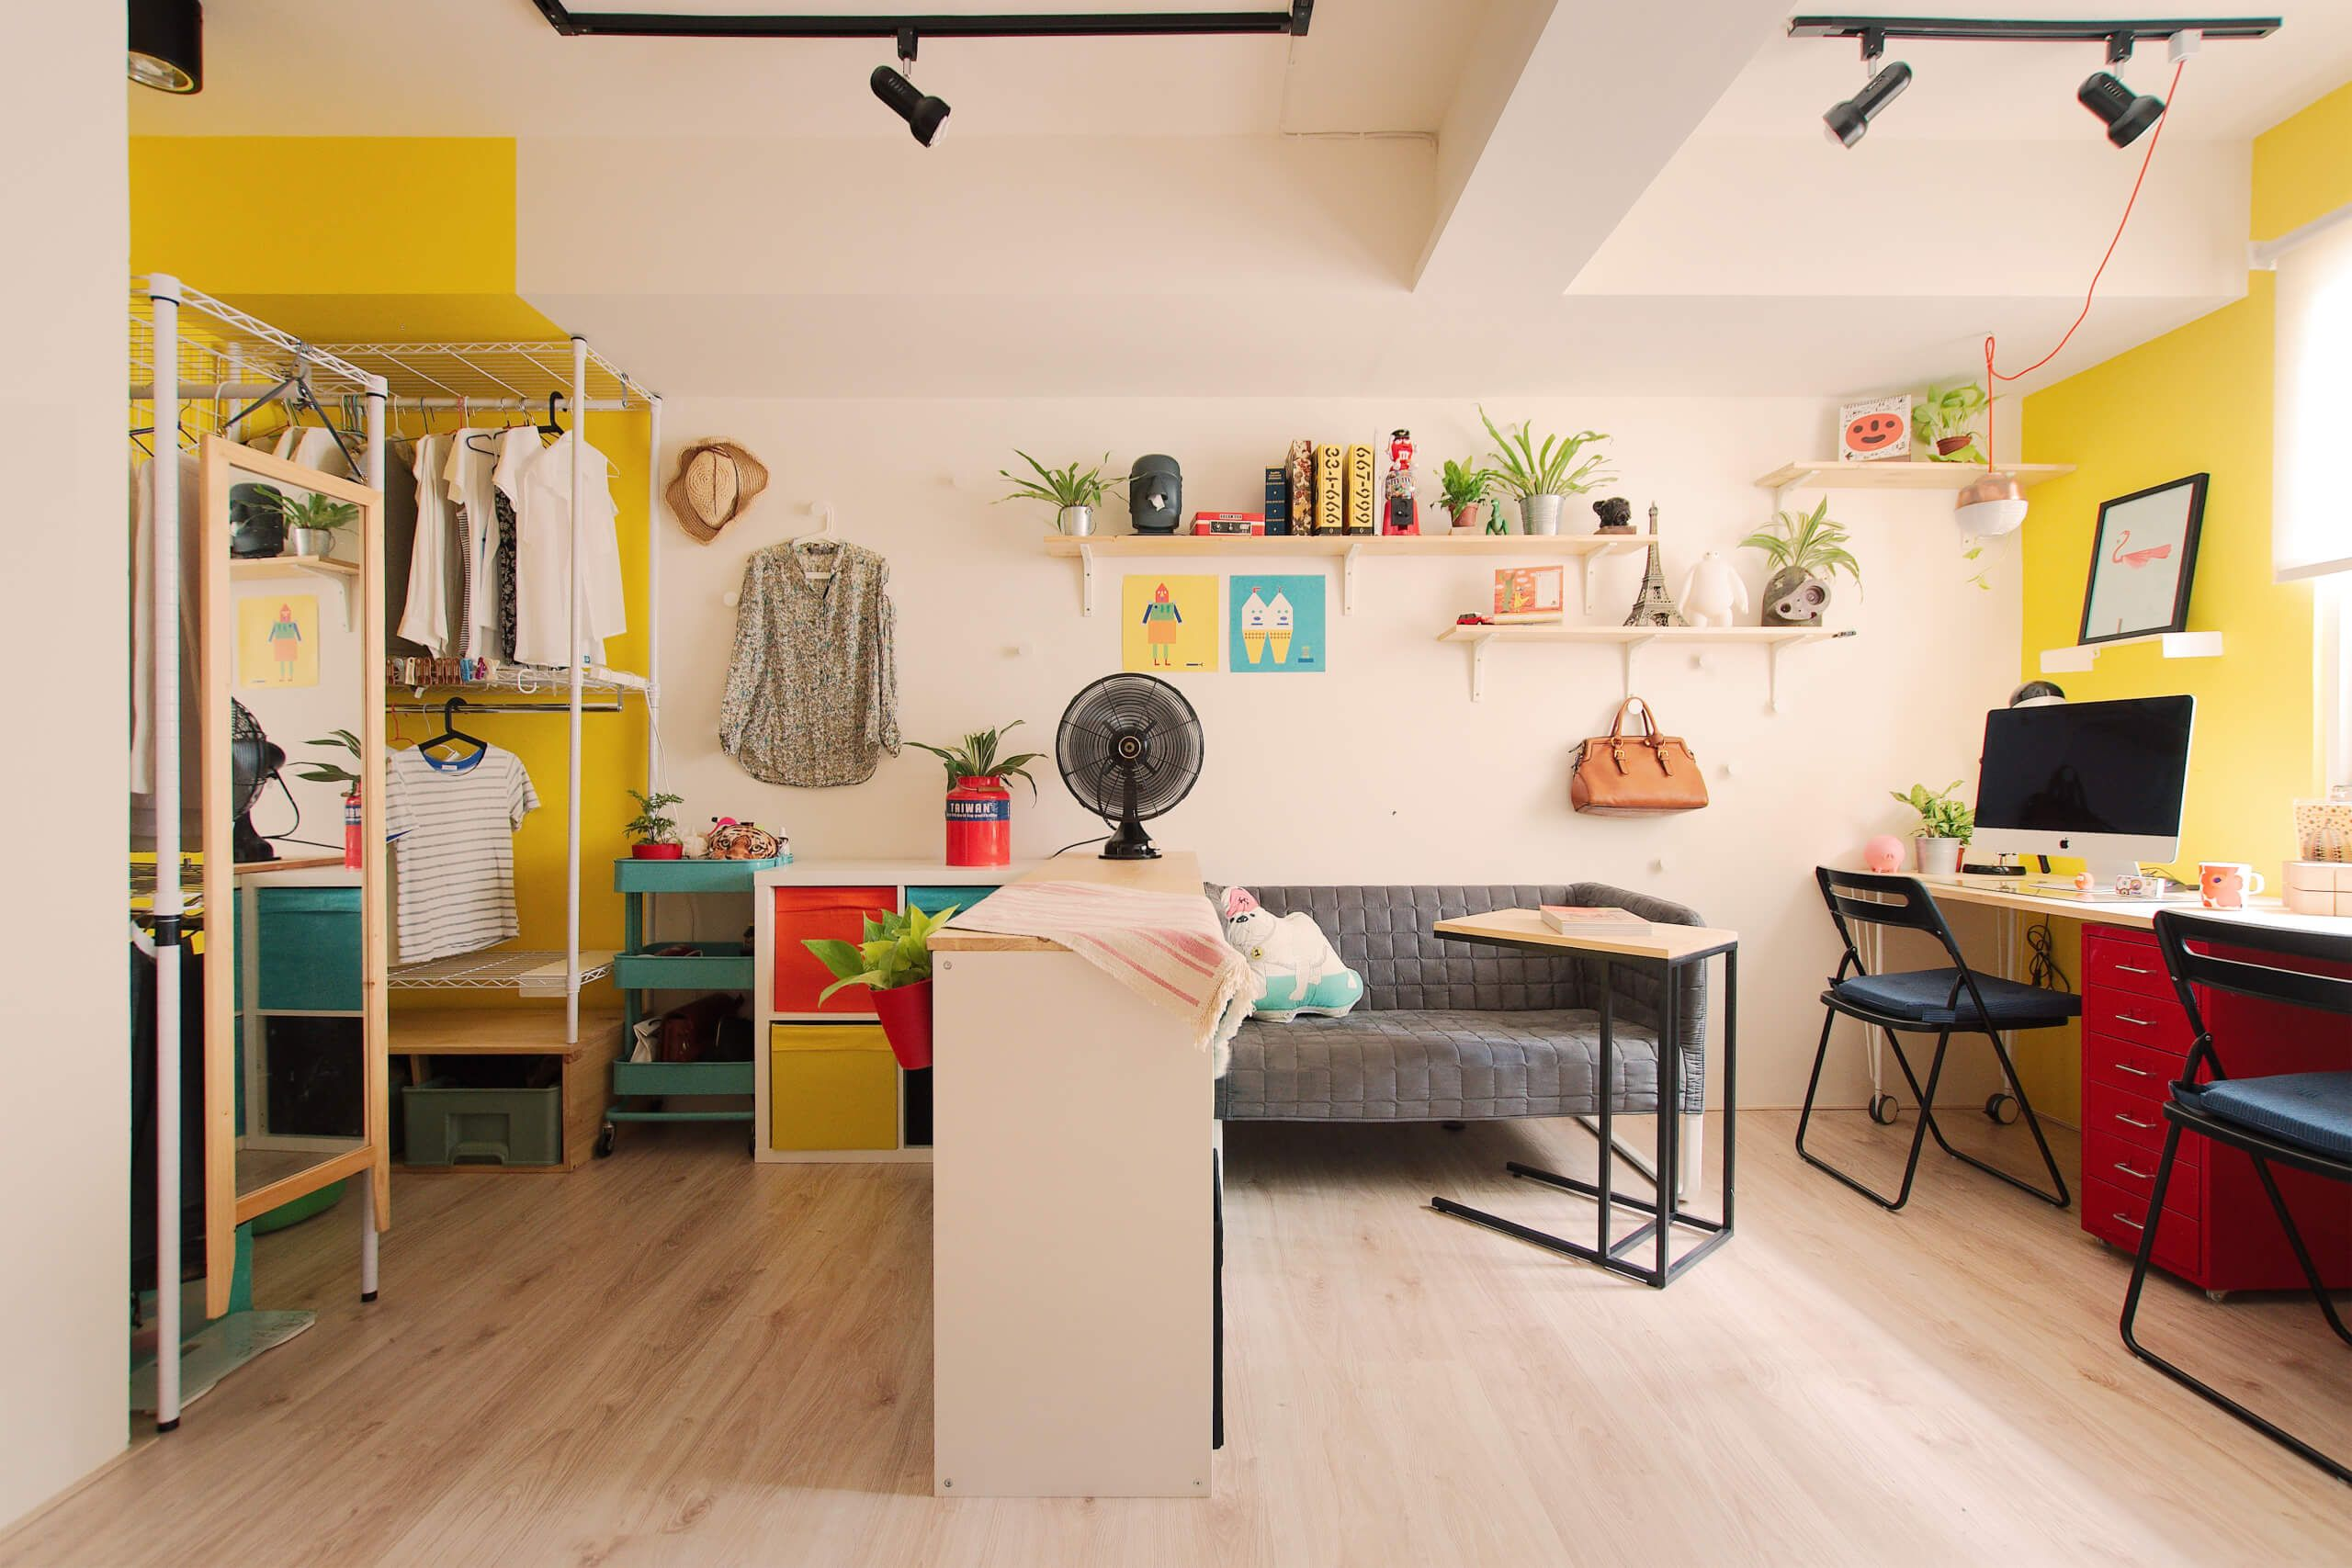 This Colorful Studio Apartment Is Not Your Average Basement Loft